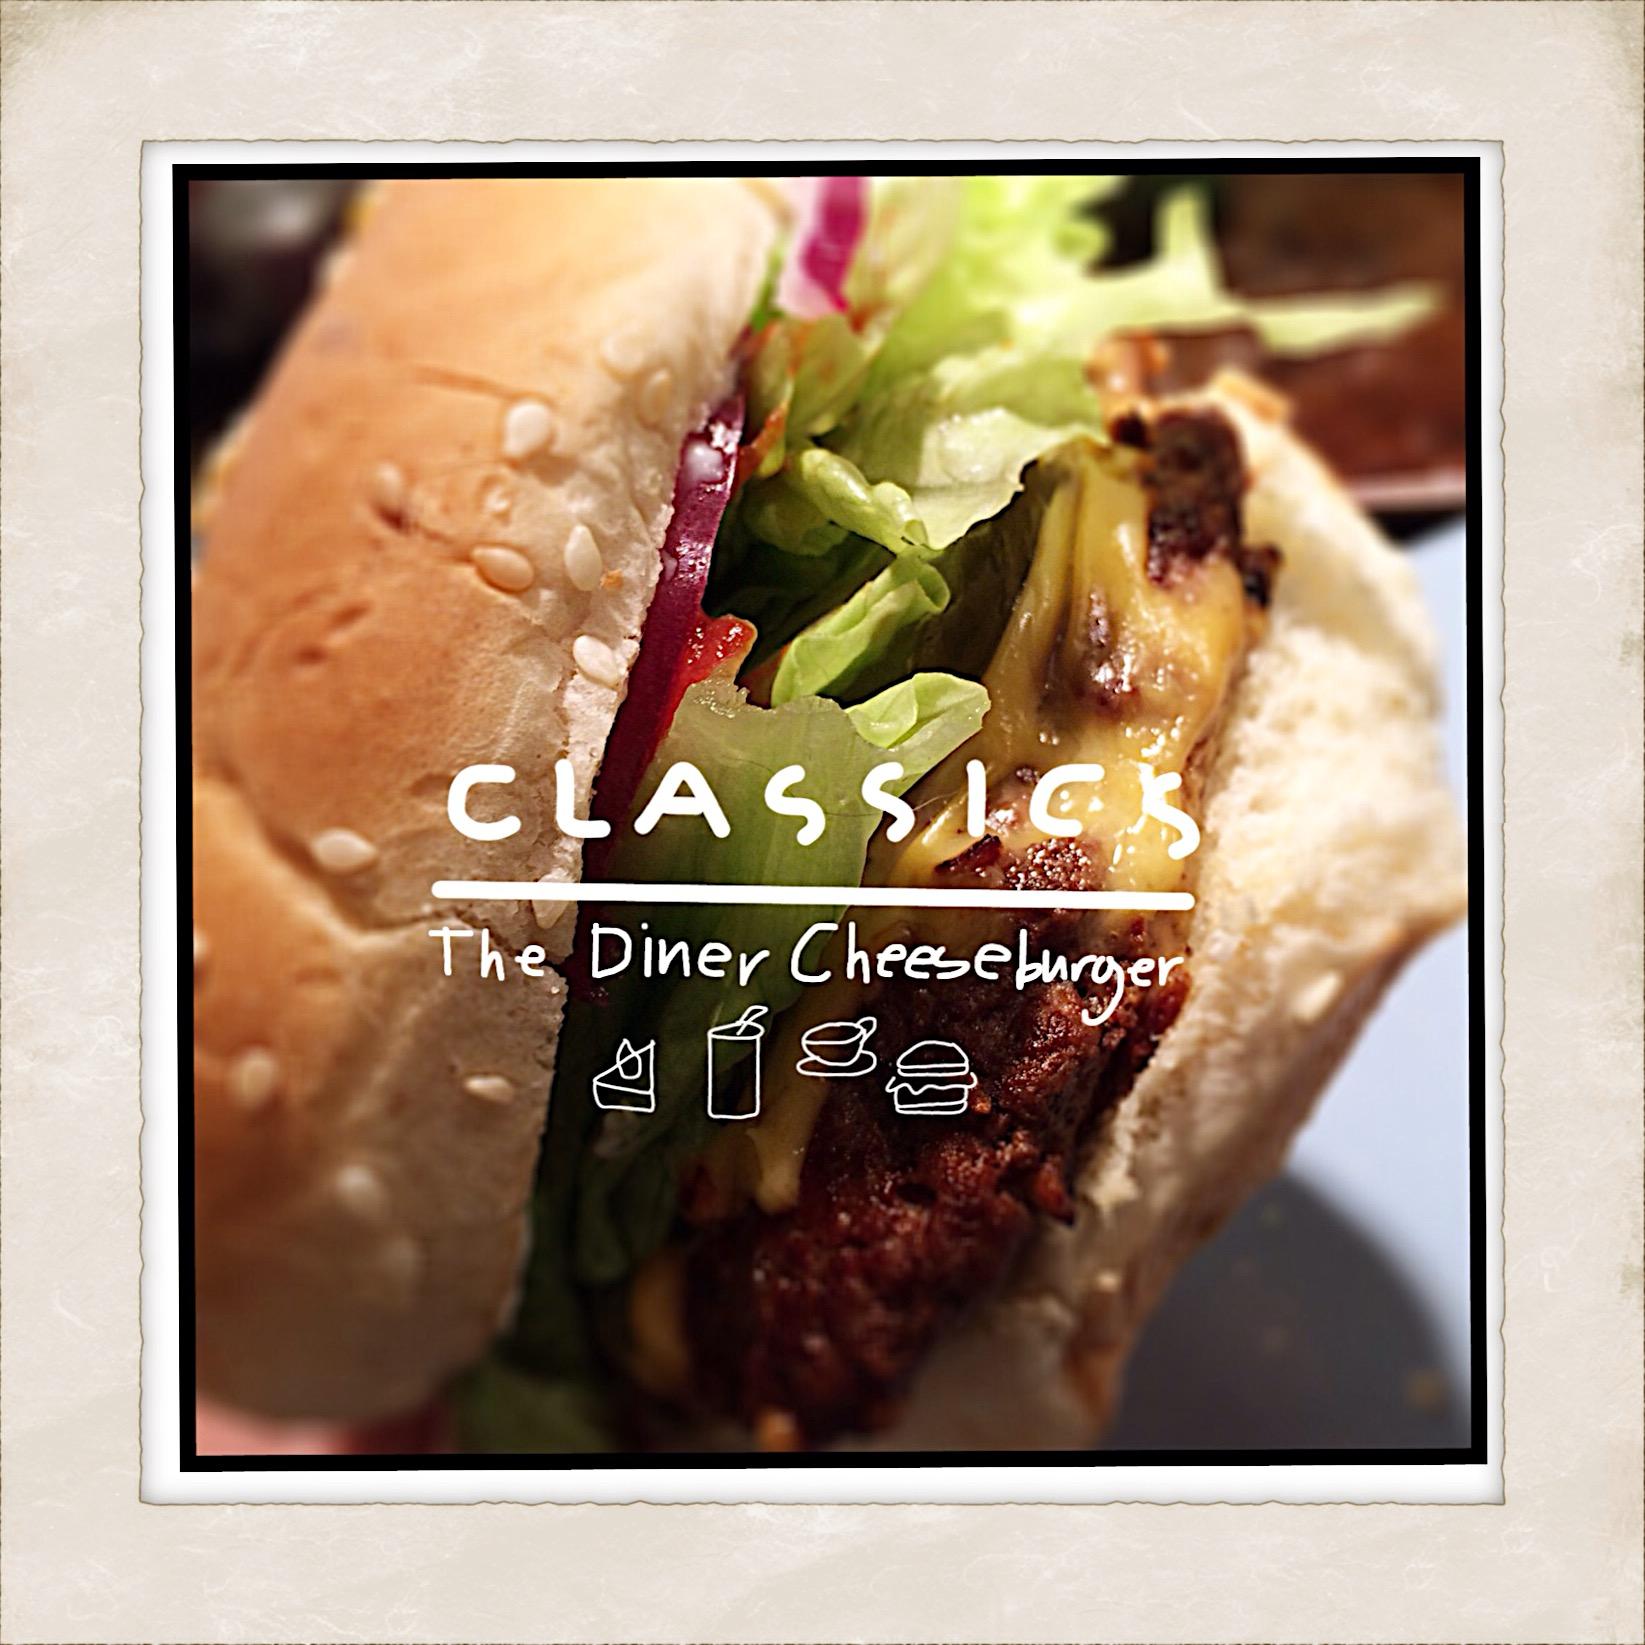 Classic Diner Cheeseburger